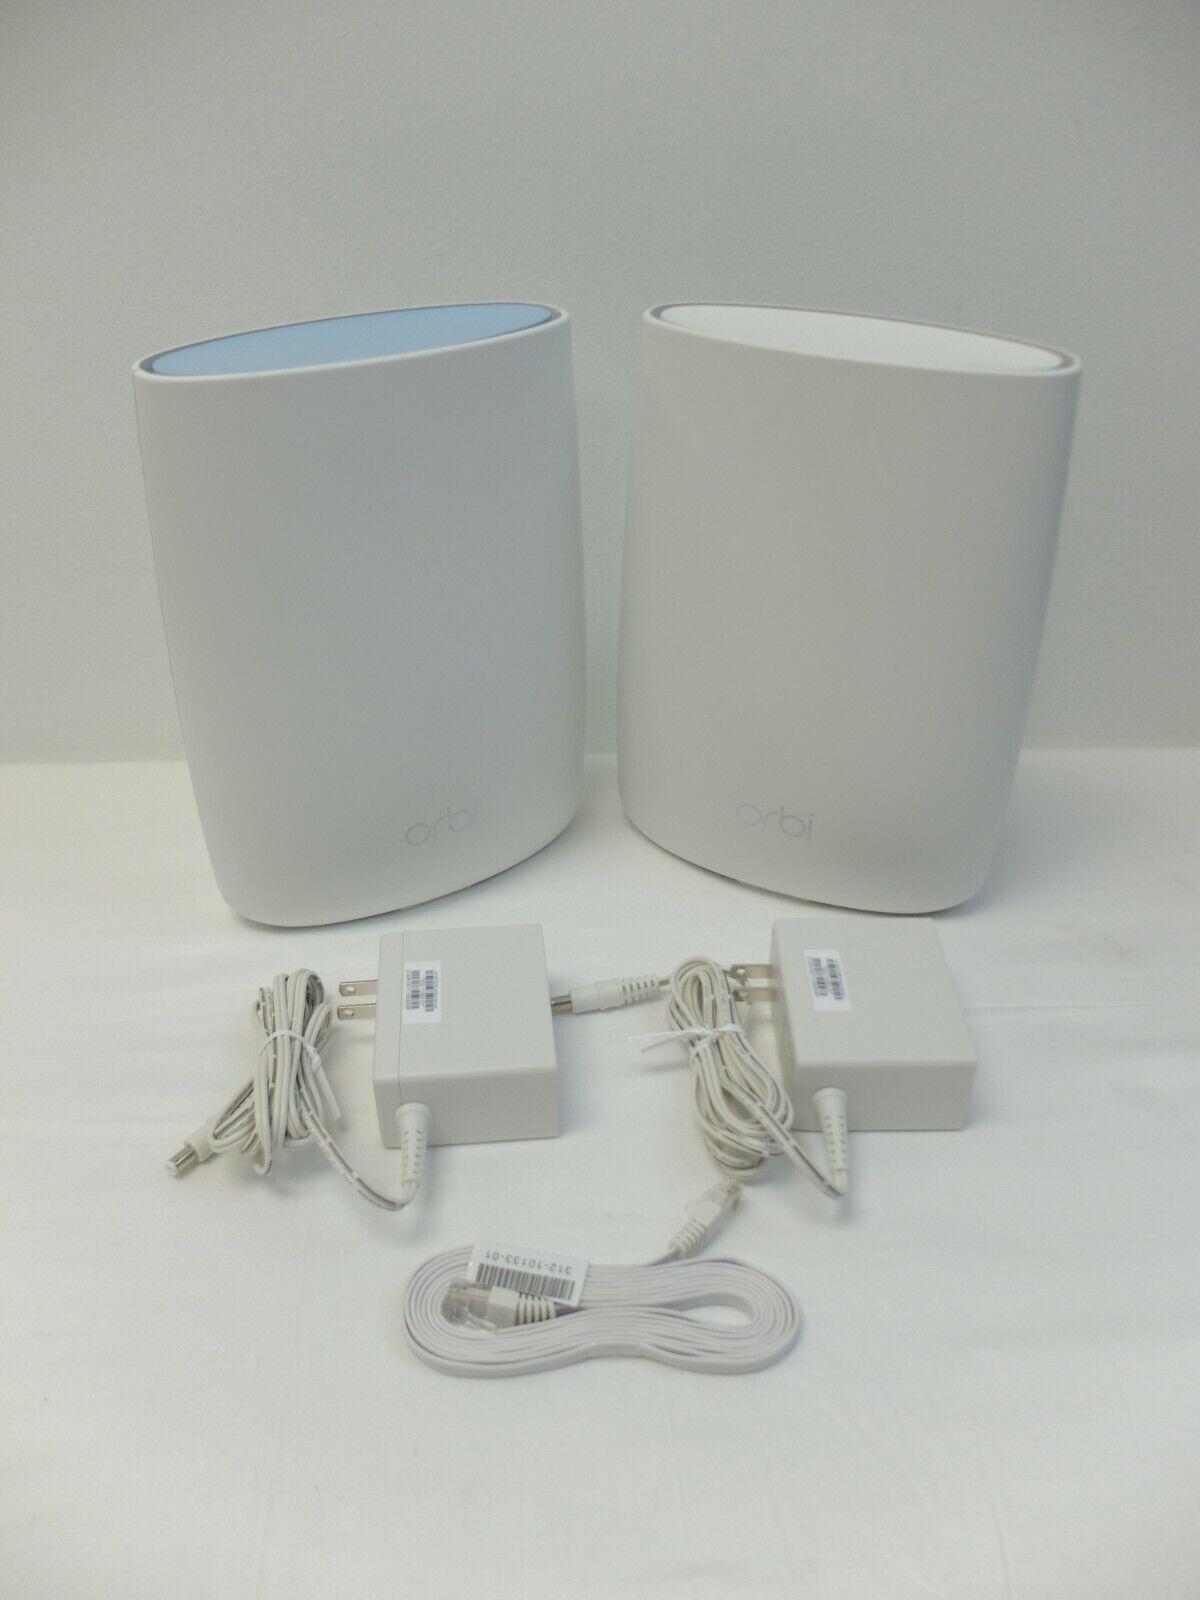 Netgear Orbi Satellite RBS50 And Router RBR50  - $104.39